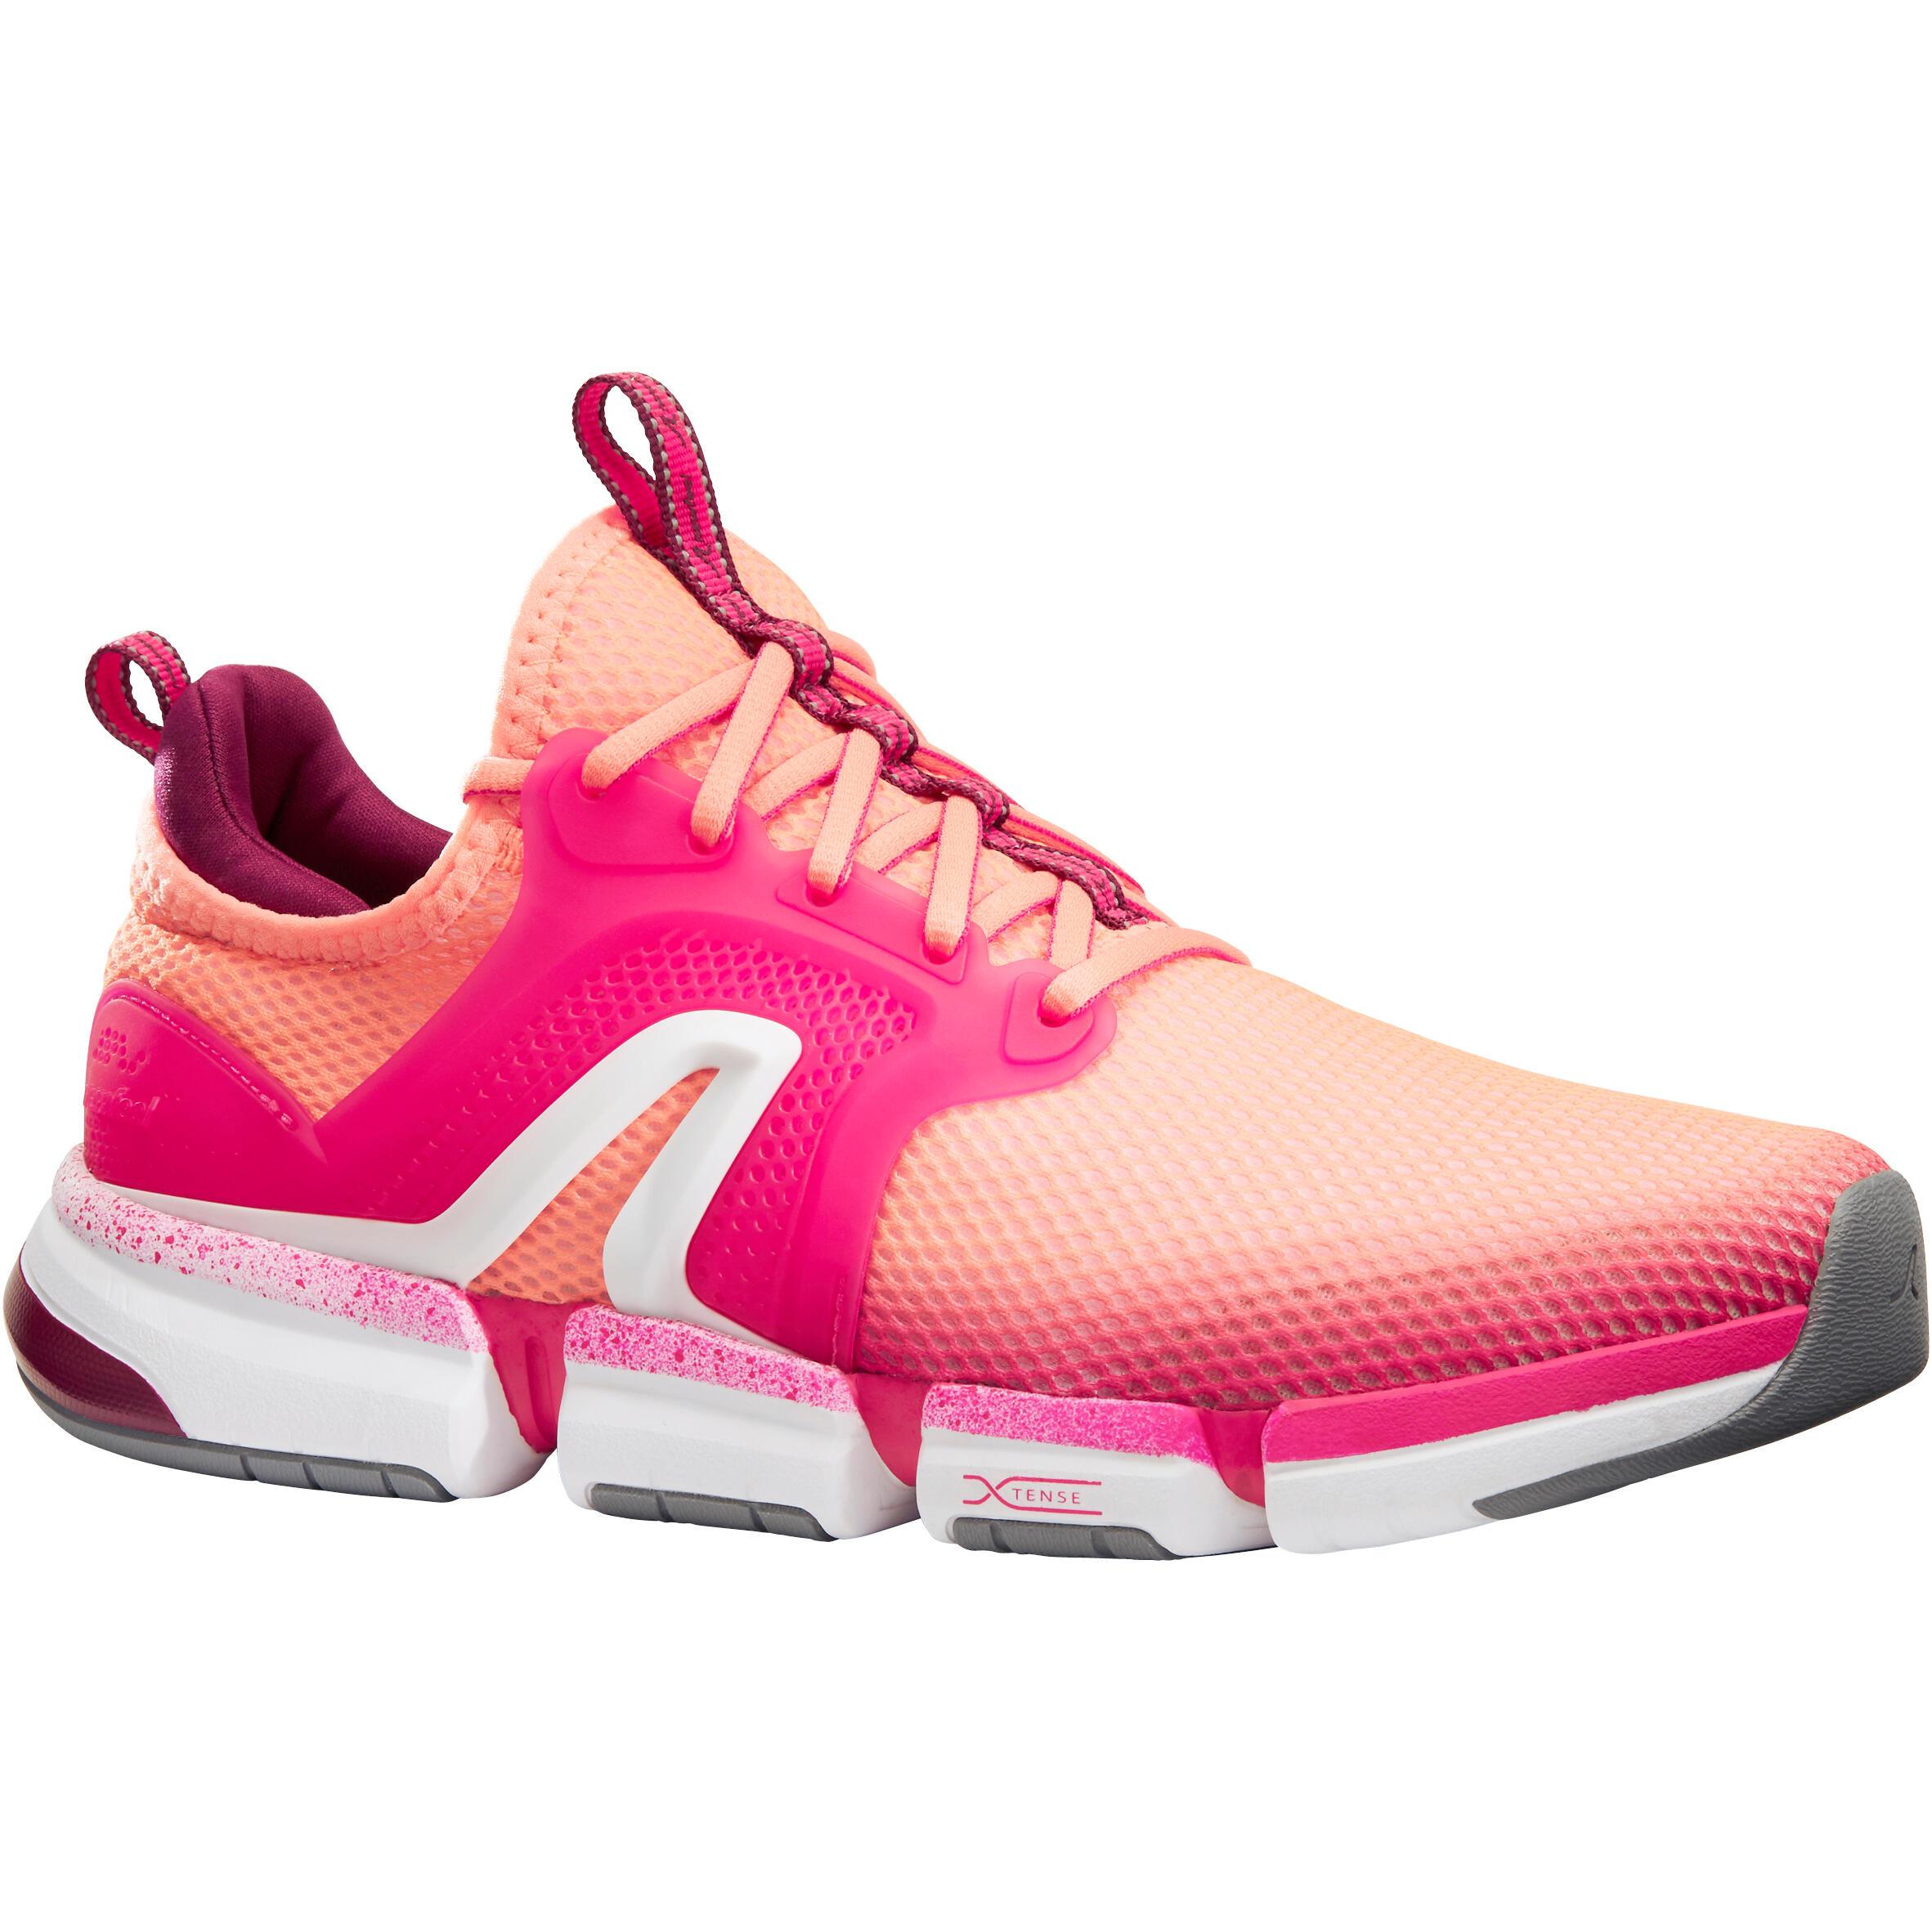 Newfeel Chaussures marche sportive femme PW 590 Xtense corail / rose - Newfeel